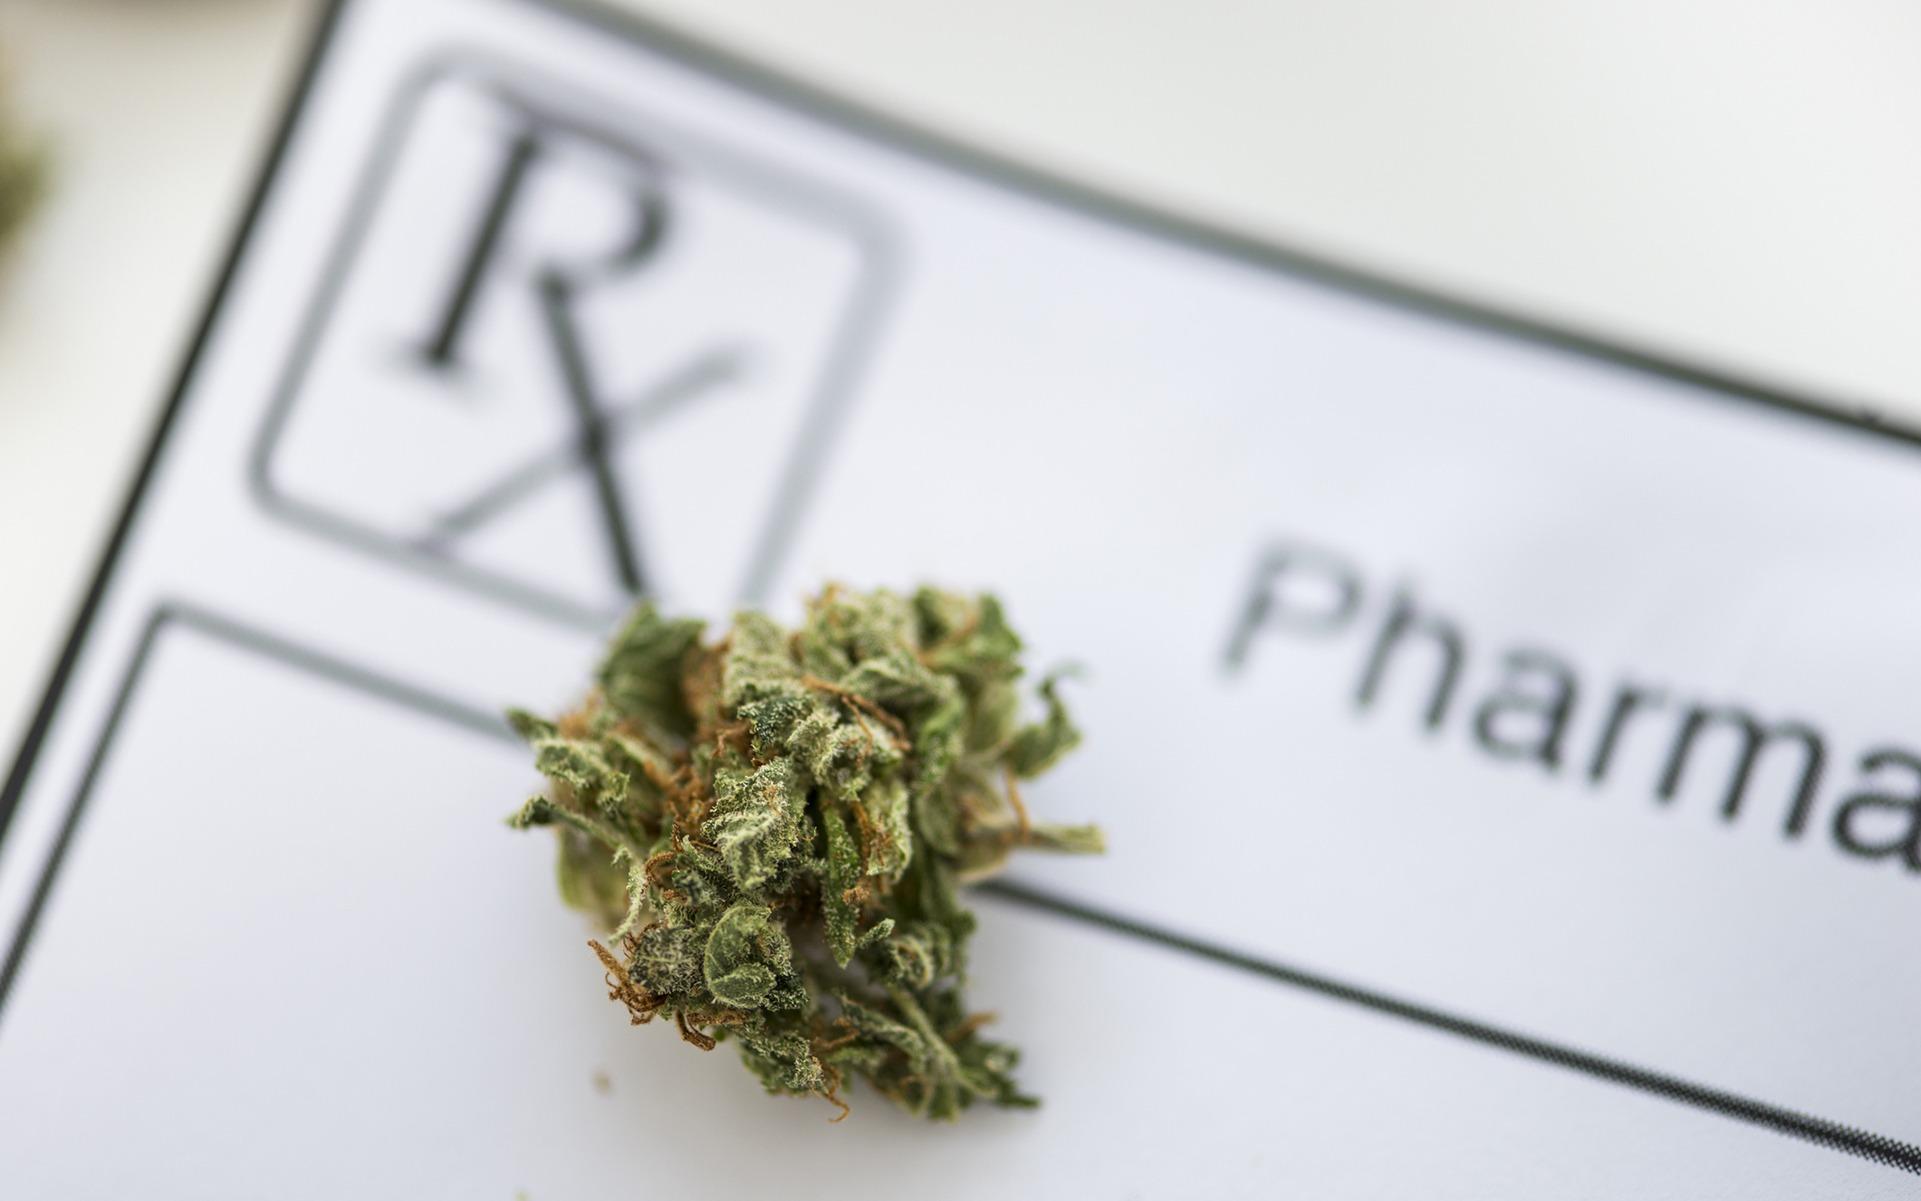 Medical marijuana is growing fast in Florida